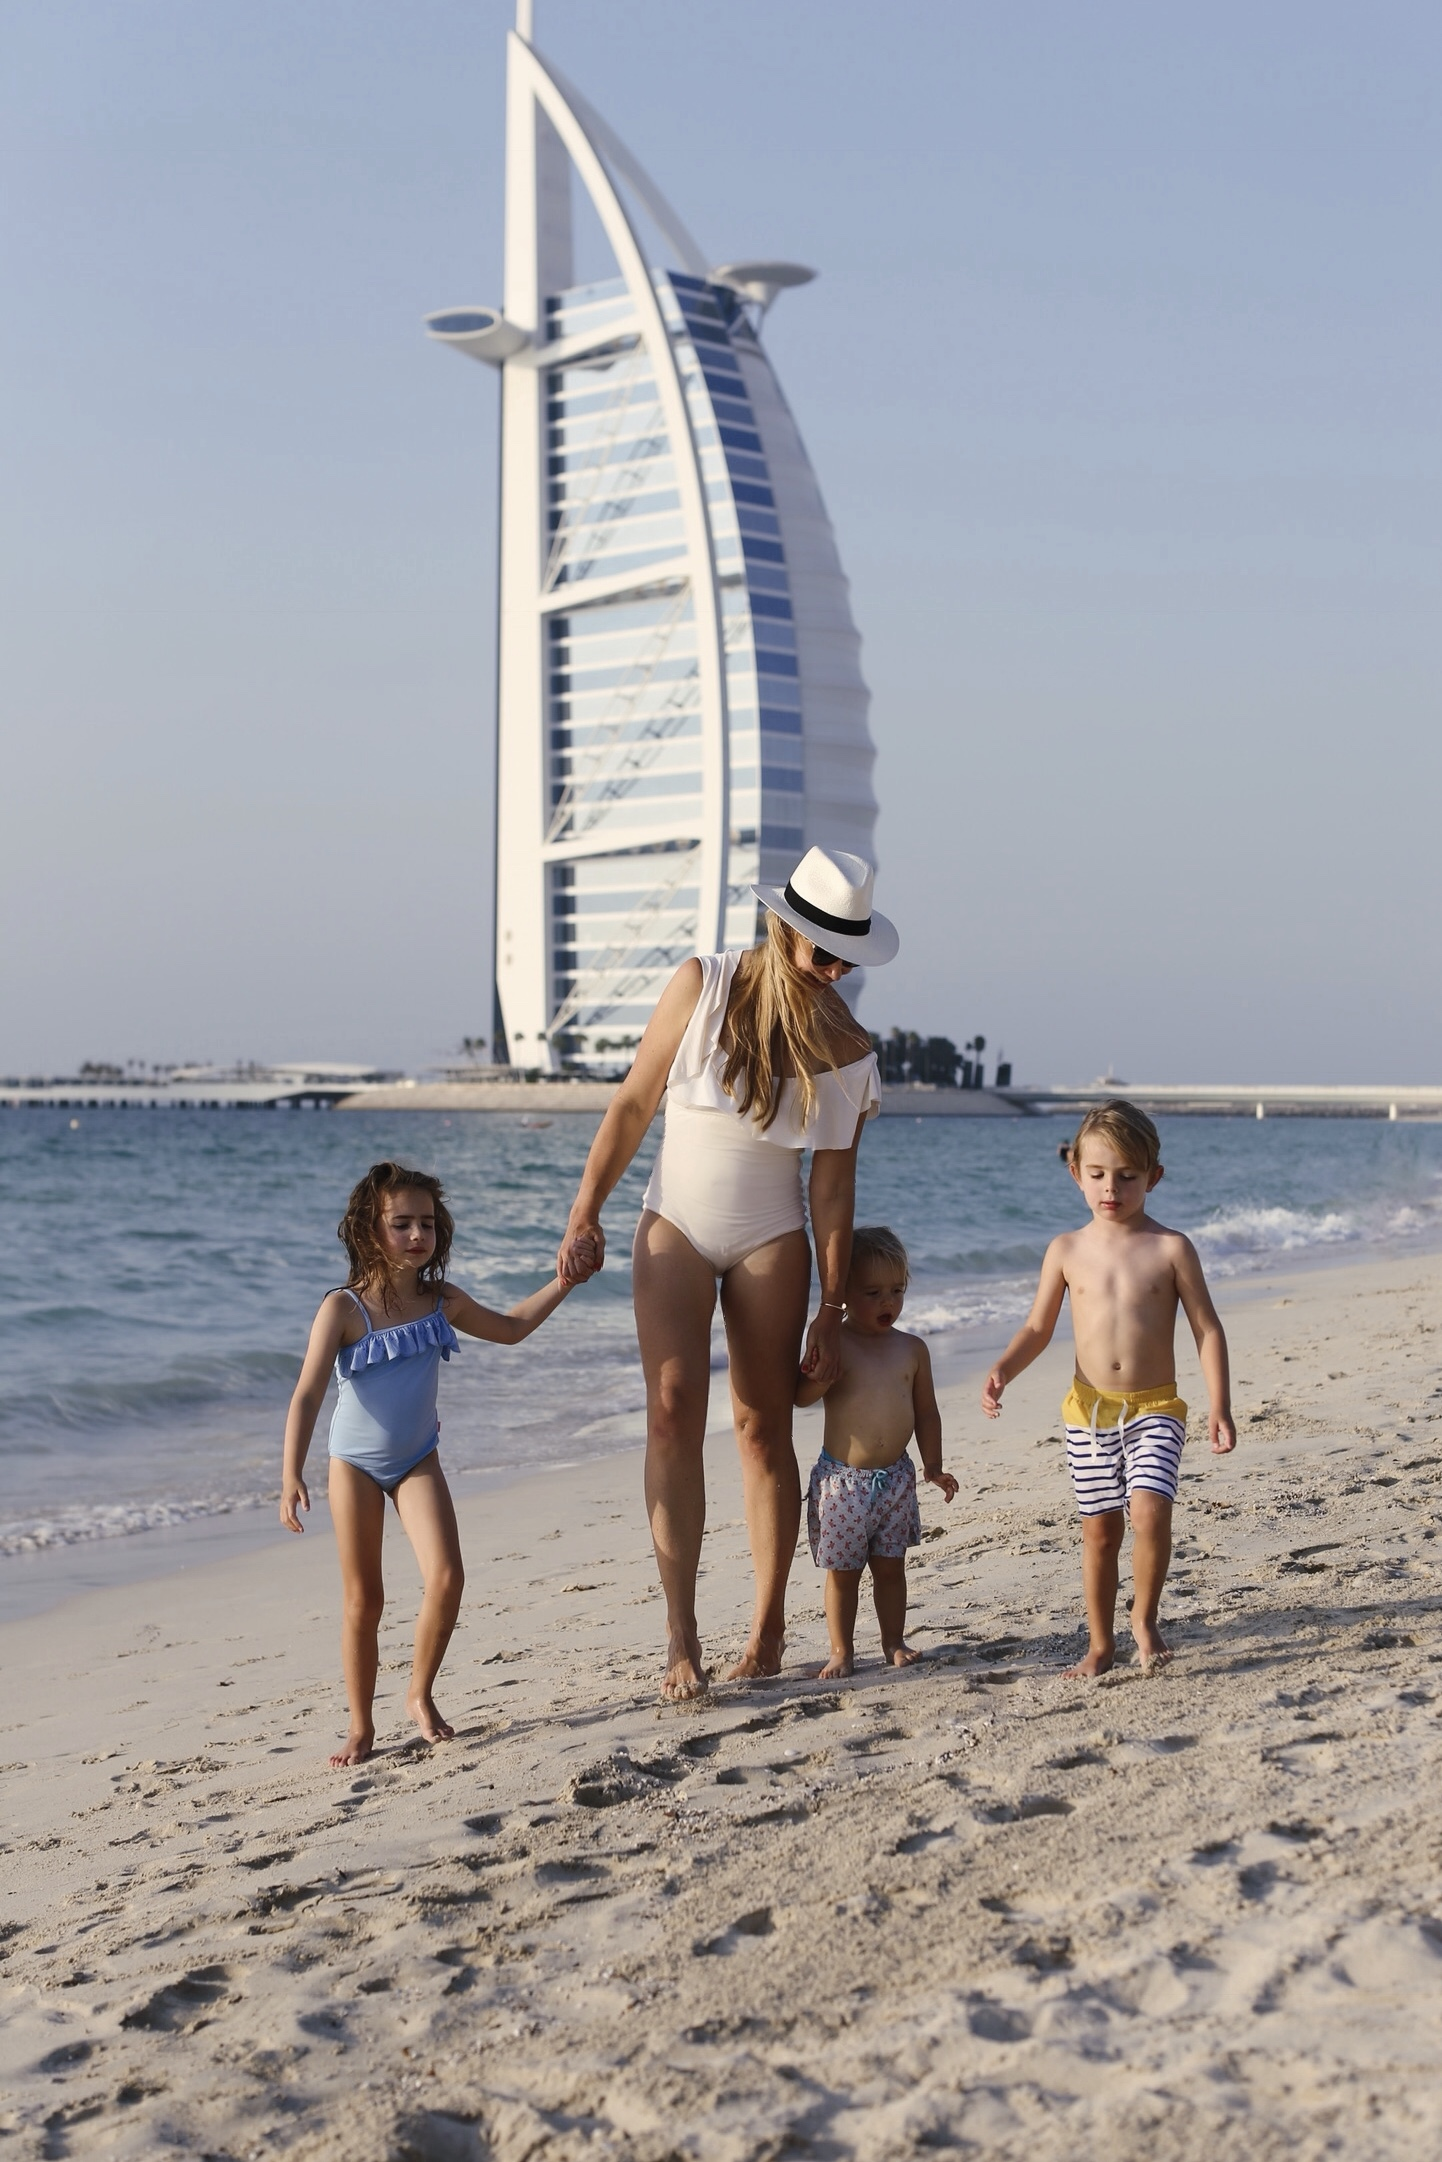 Me and the kids by Dubai's ever-photogenic Burj Al Arab